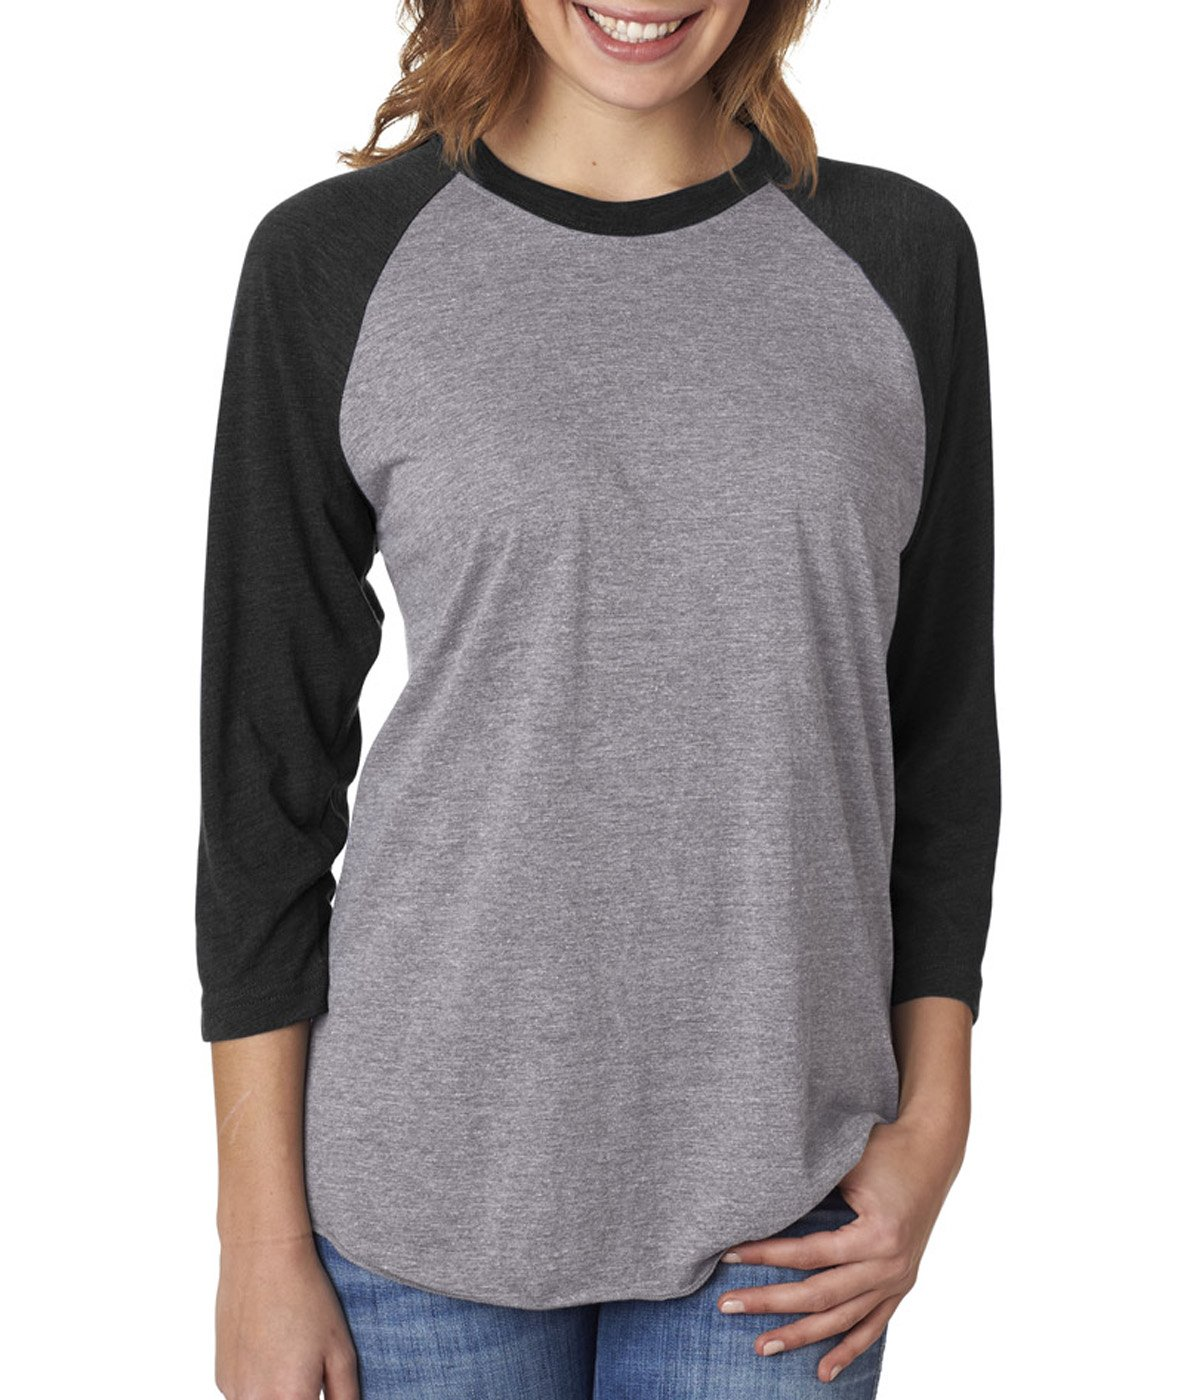 Next Level 6051 - Vintage Black Sleeves/Premium Heather Body-Small